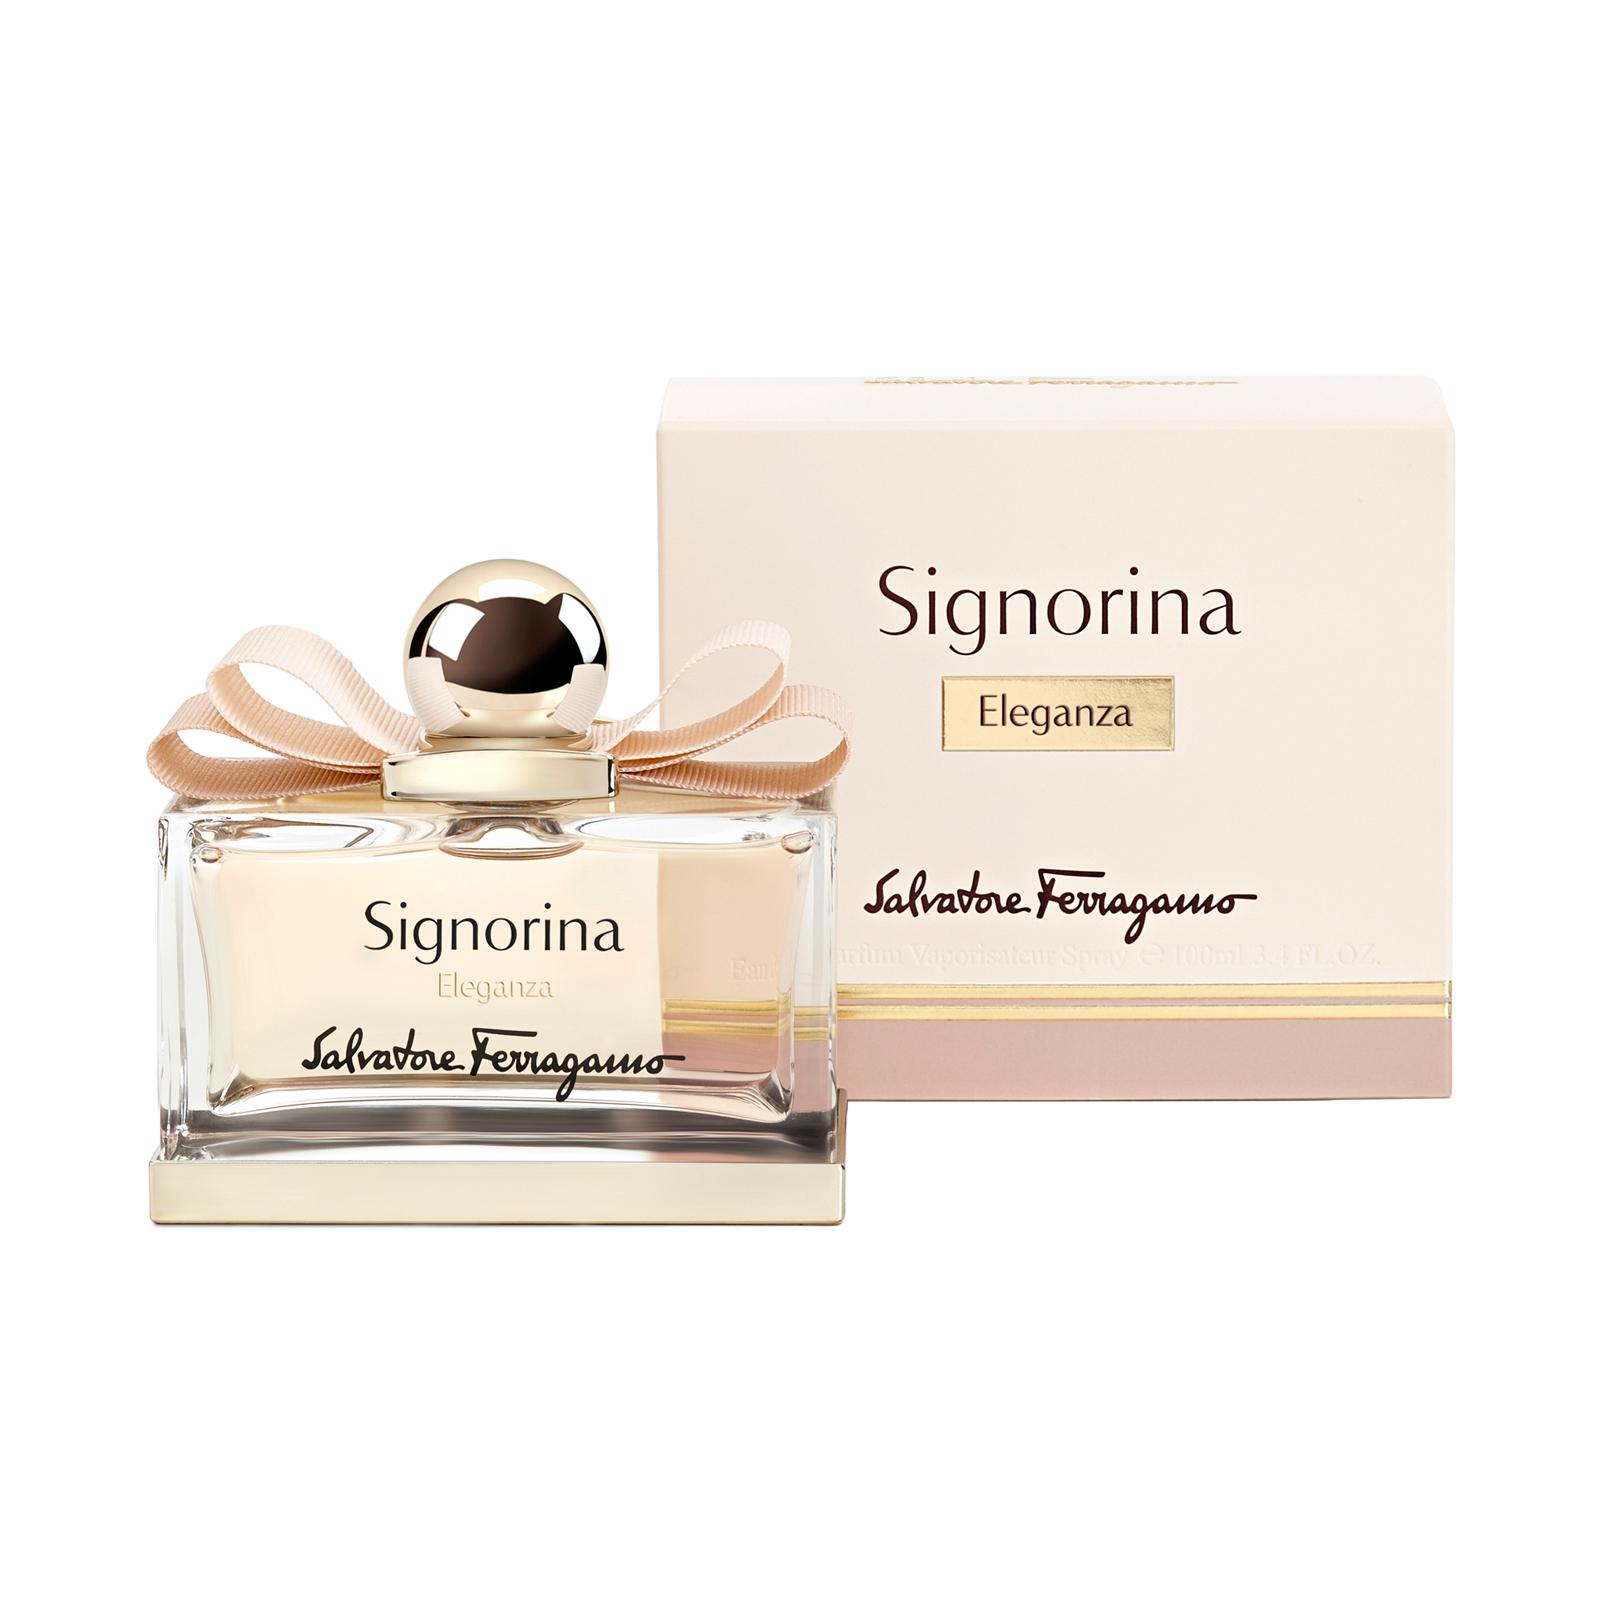 Salvatore Ferragamo Signorina Eleganza - parfémová voda W Objem: 50 ml